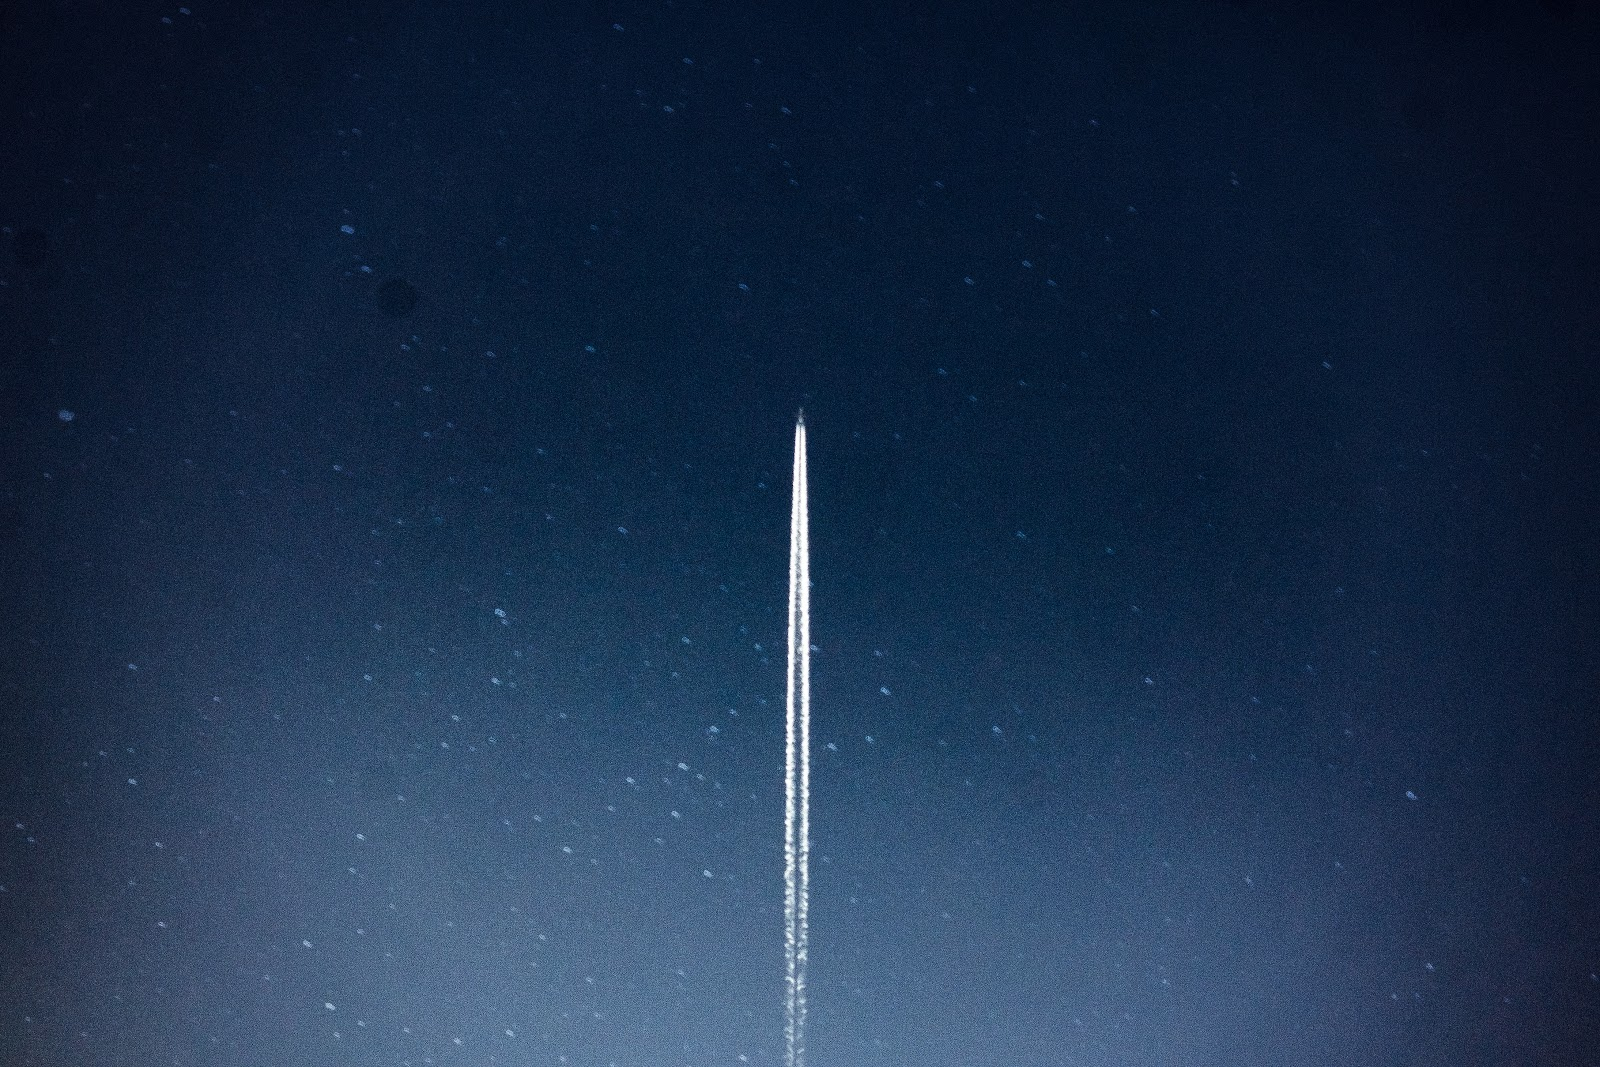 A rocket ascends